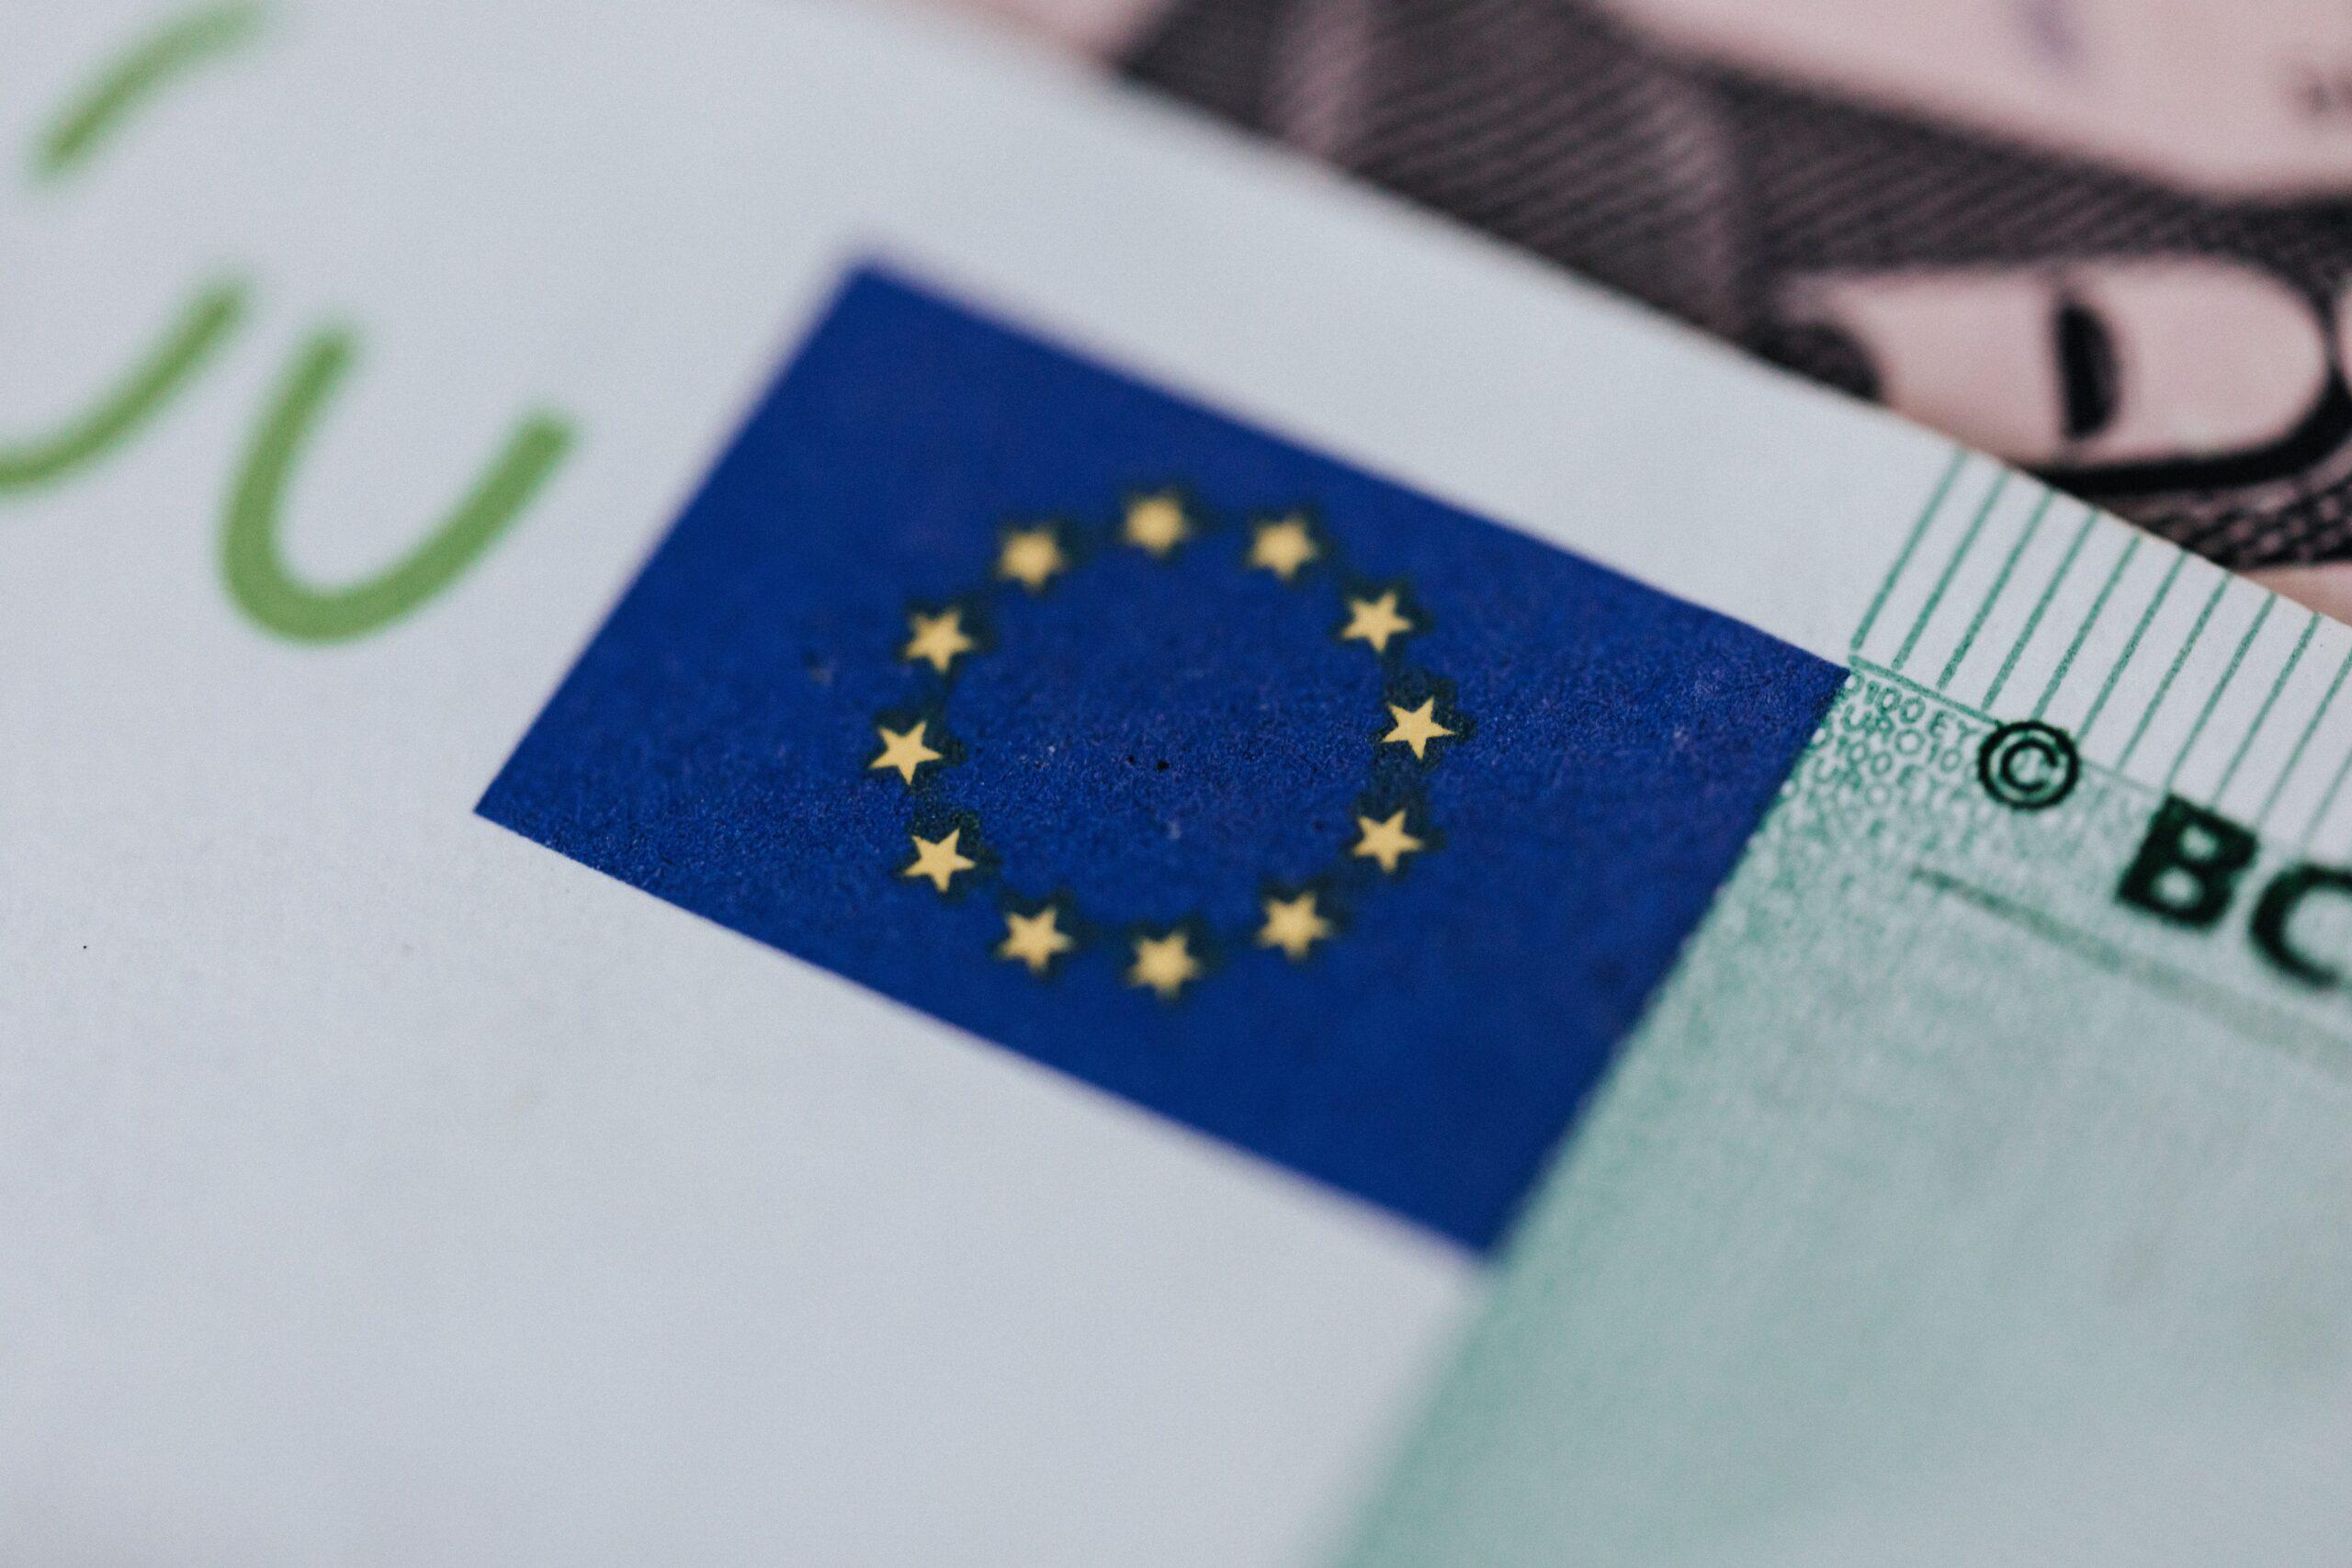 E-kaubanduse trendid Euroopas 2020